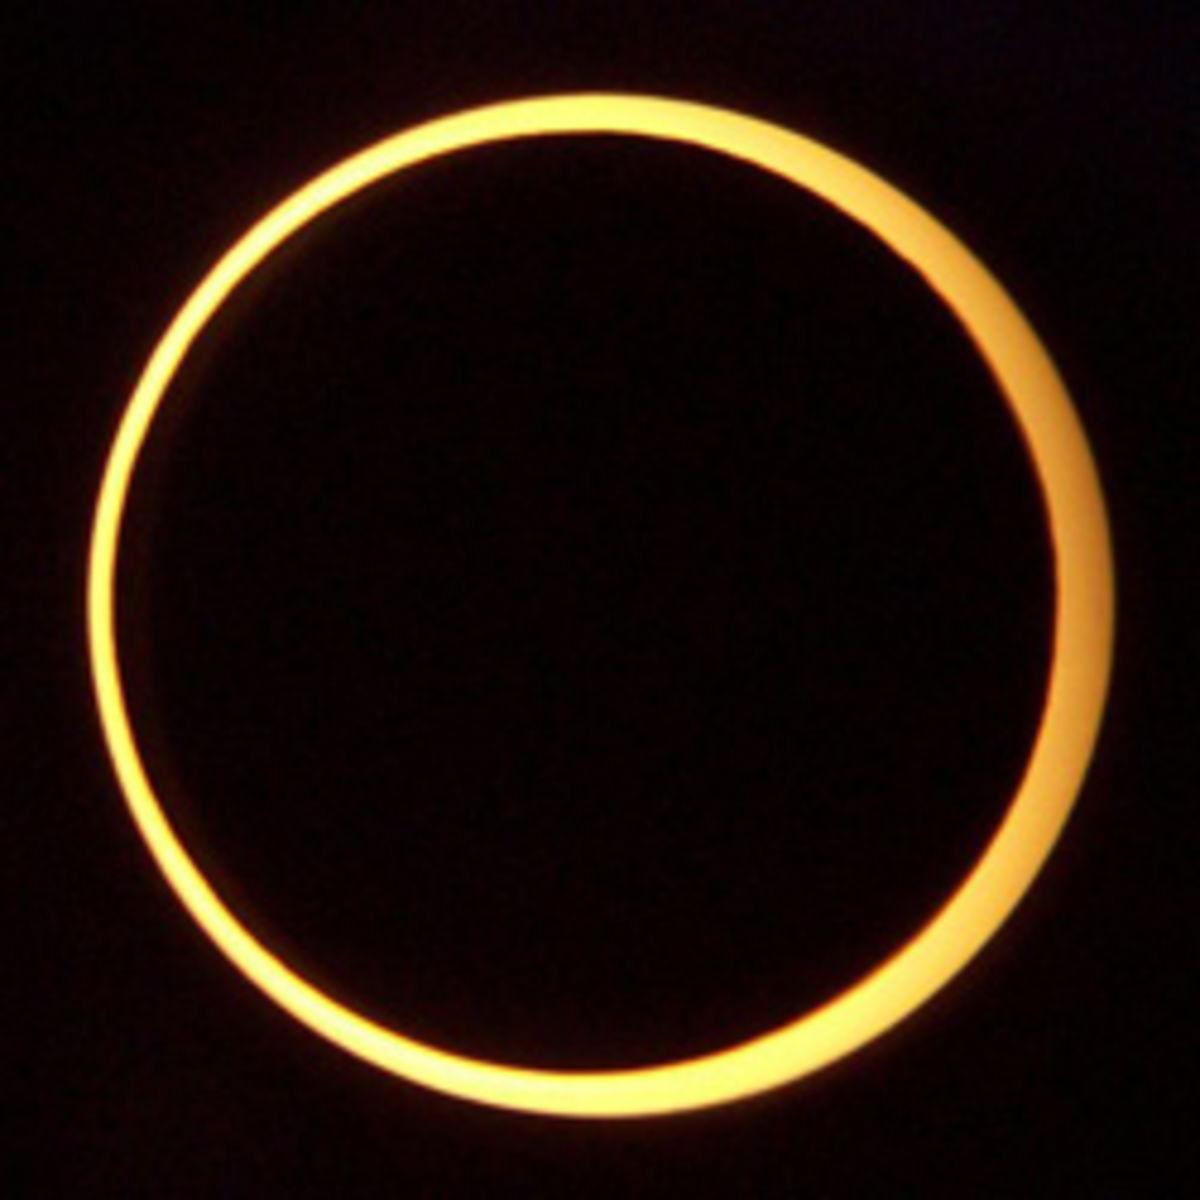 annulareclipse_may202012.jpg